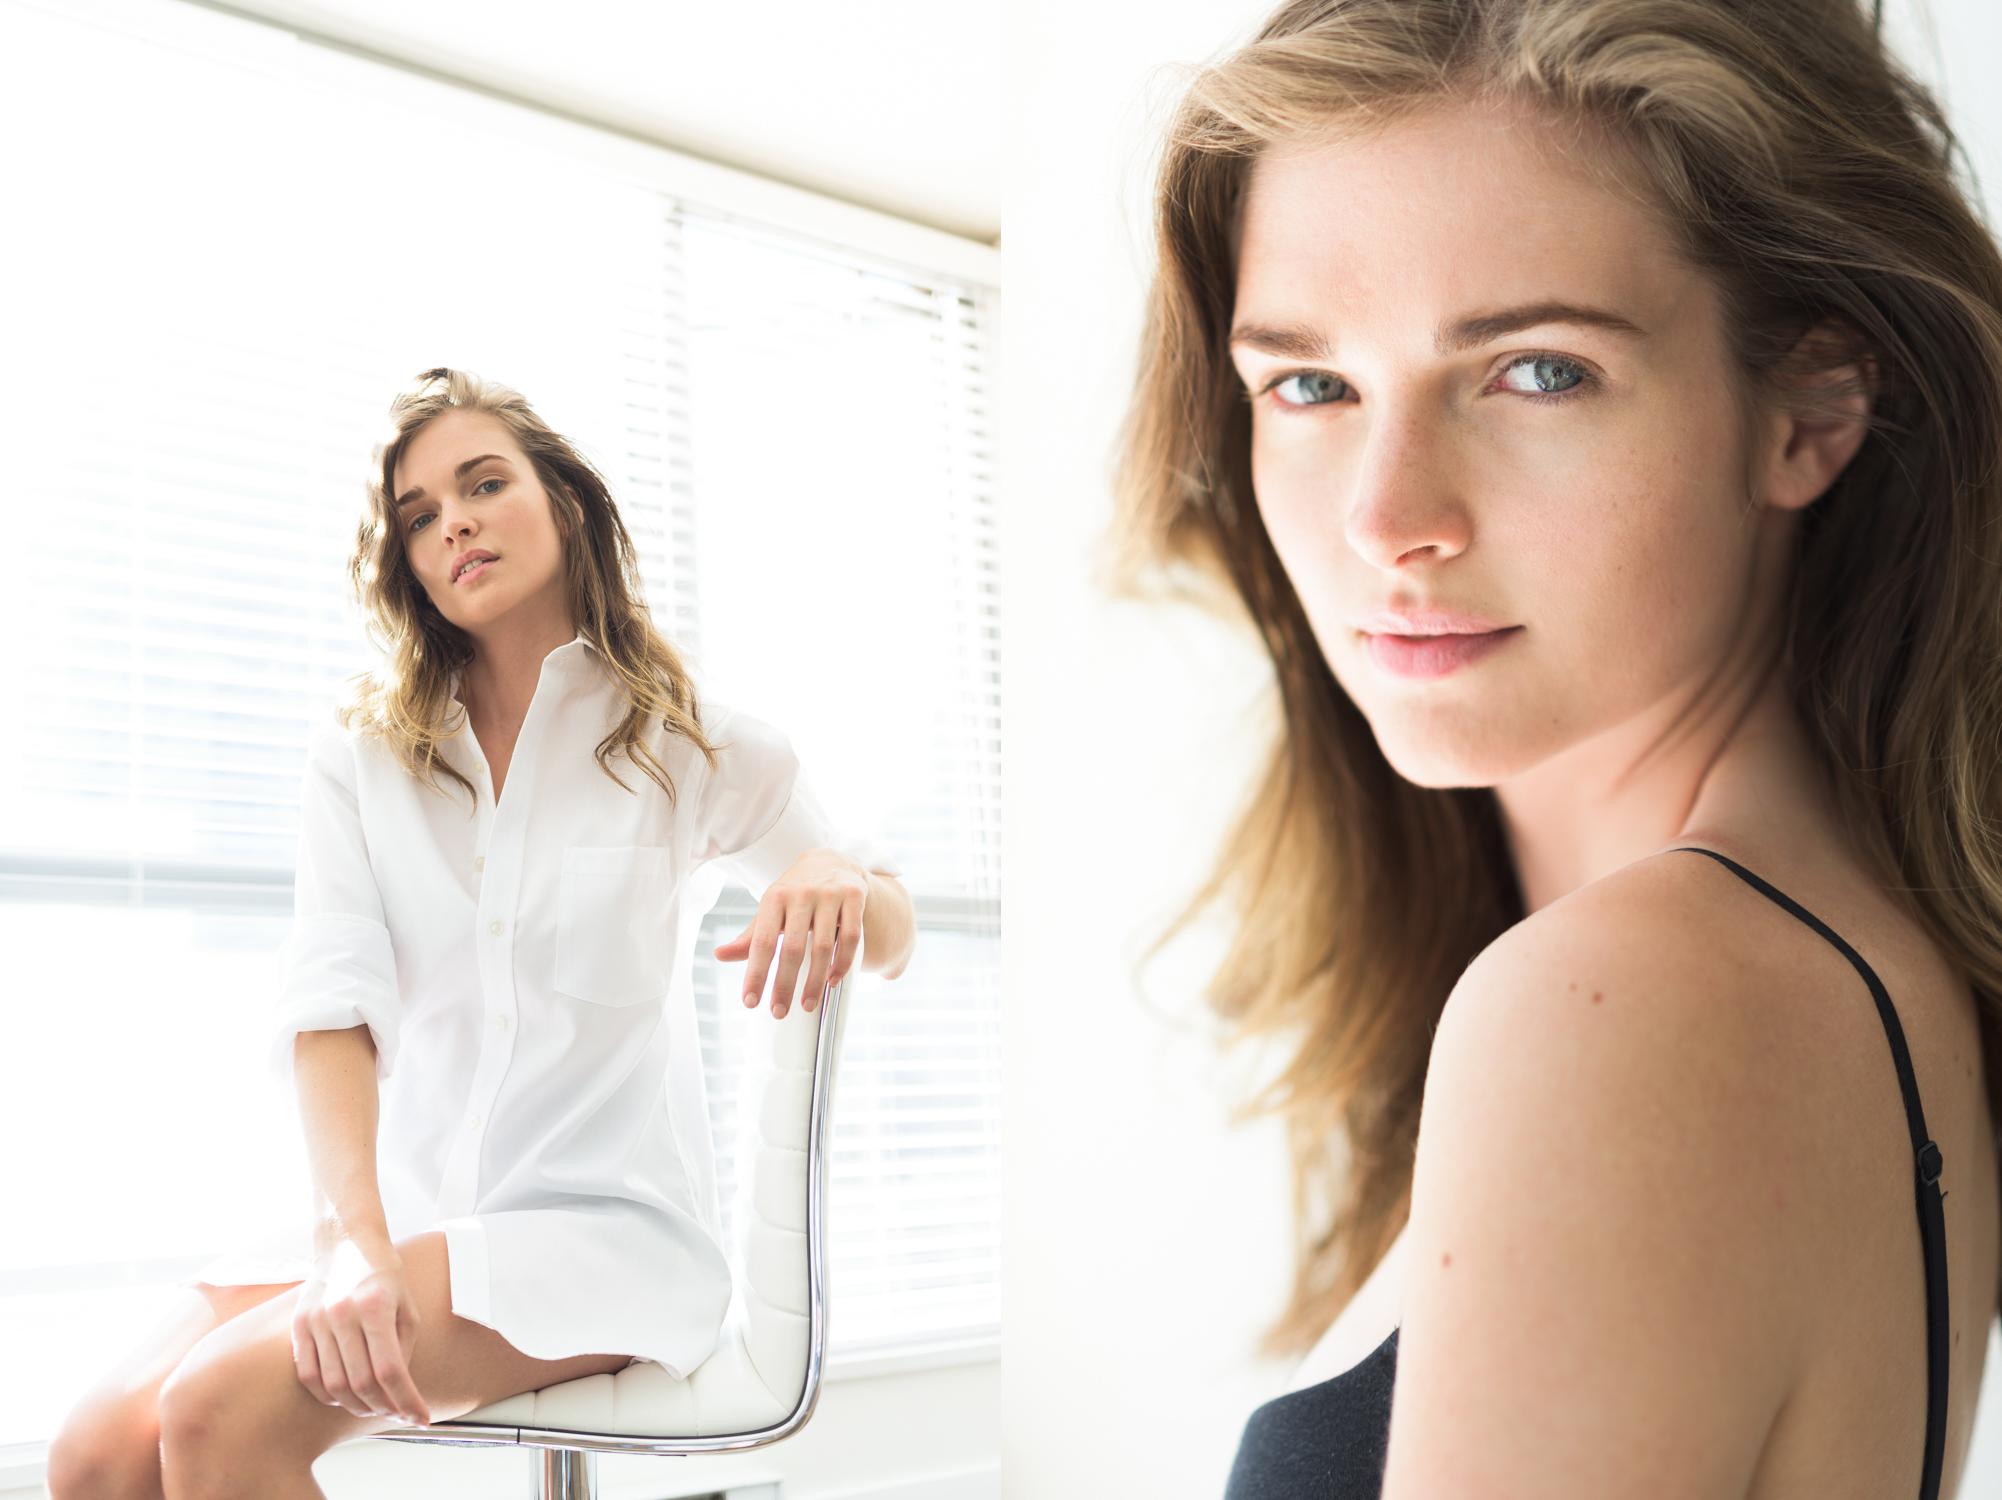 Sarah | Next Models Canada